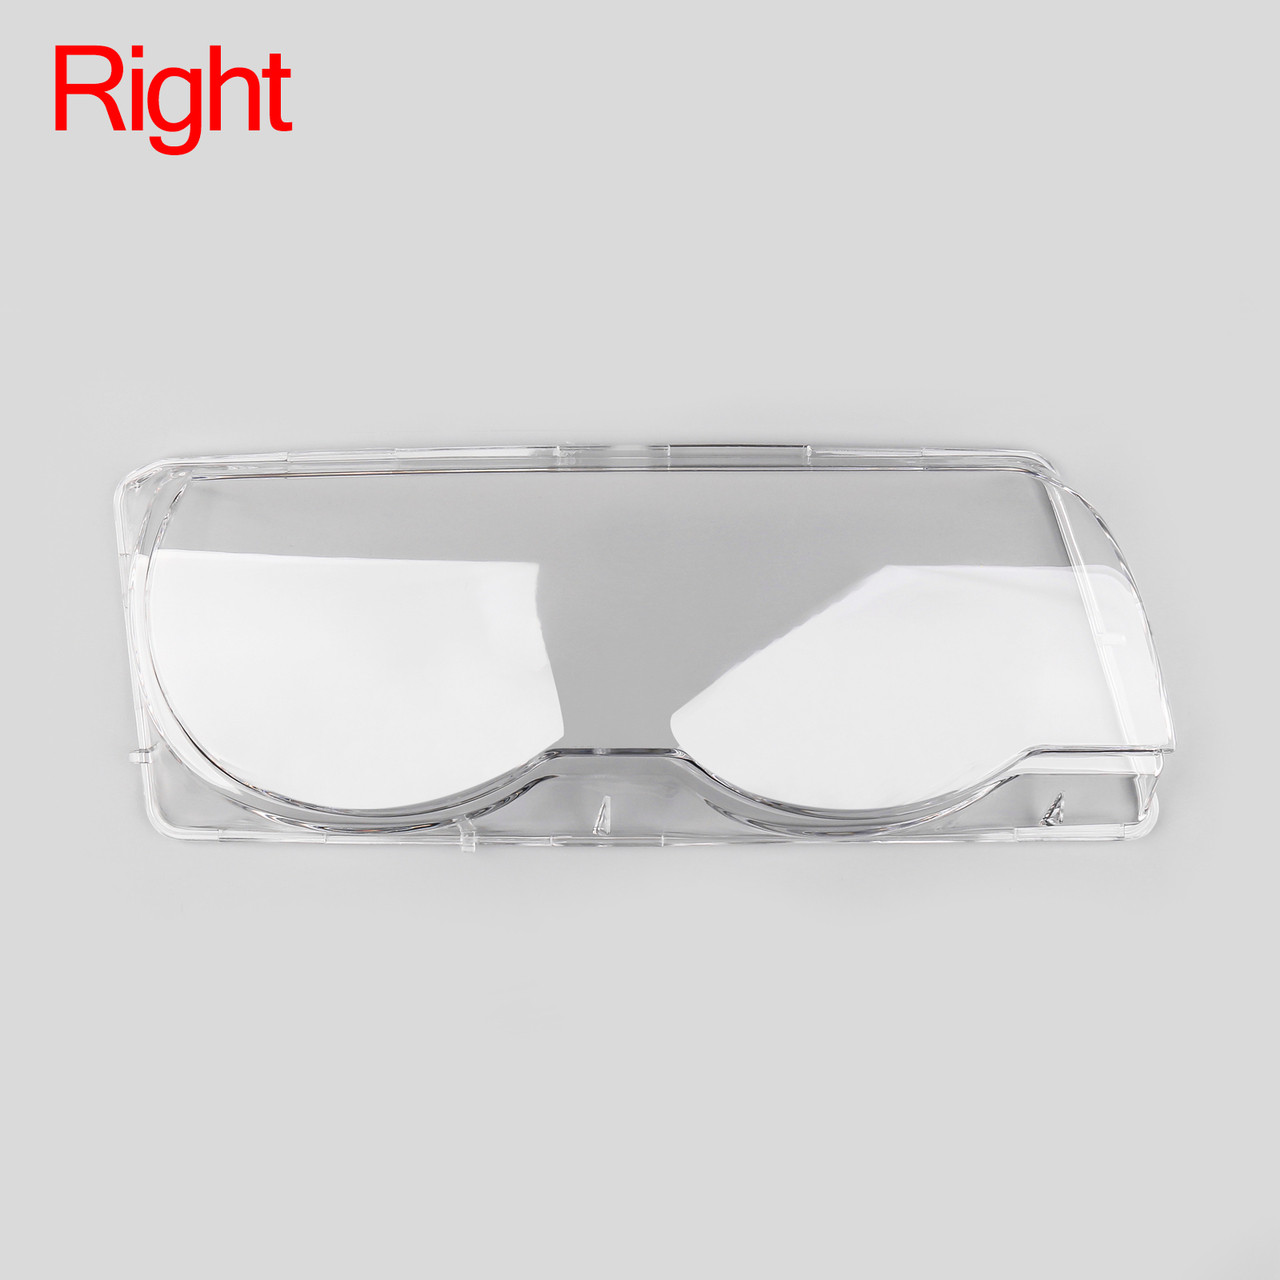 Car Clear Headlight Headlamp Lens Cover Shell Pair For BMW E38 (1999-2001)